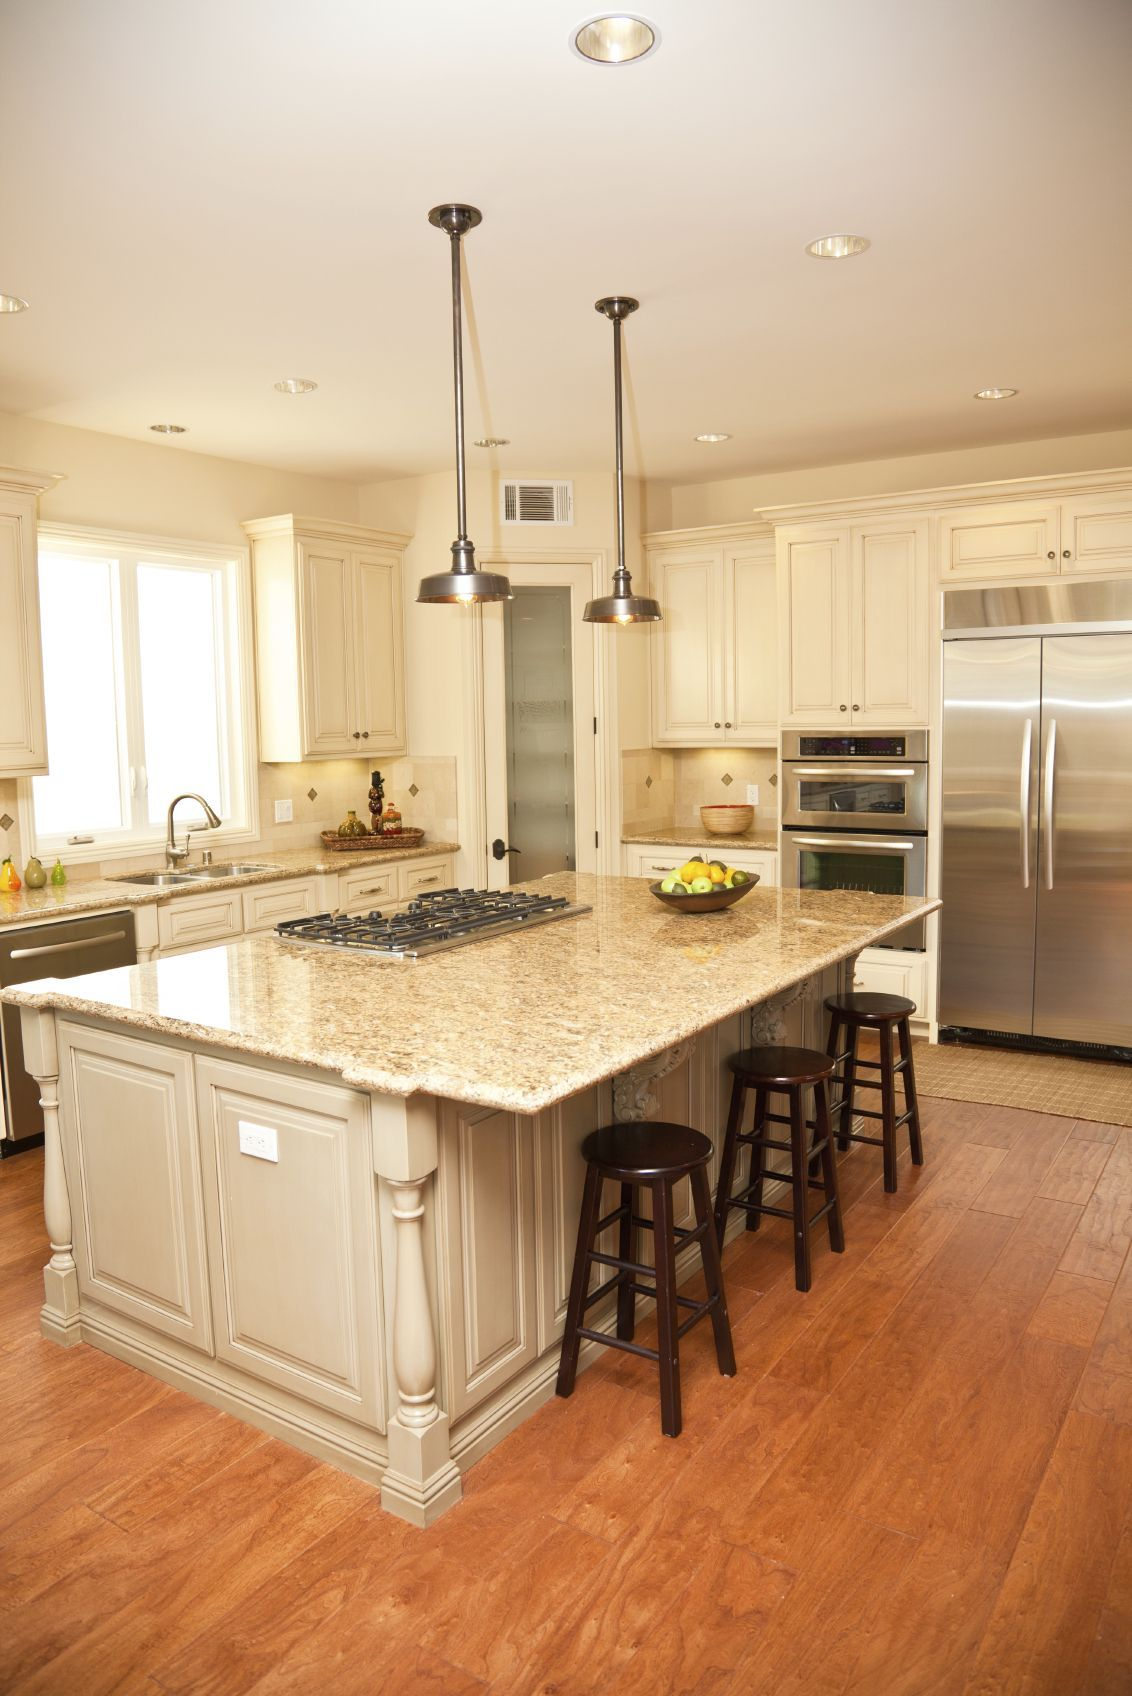 90 Different Kitchen Island Ideas and Designs (Photos ...